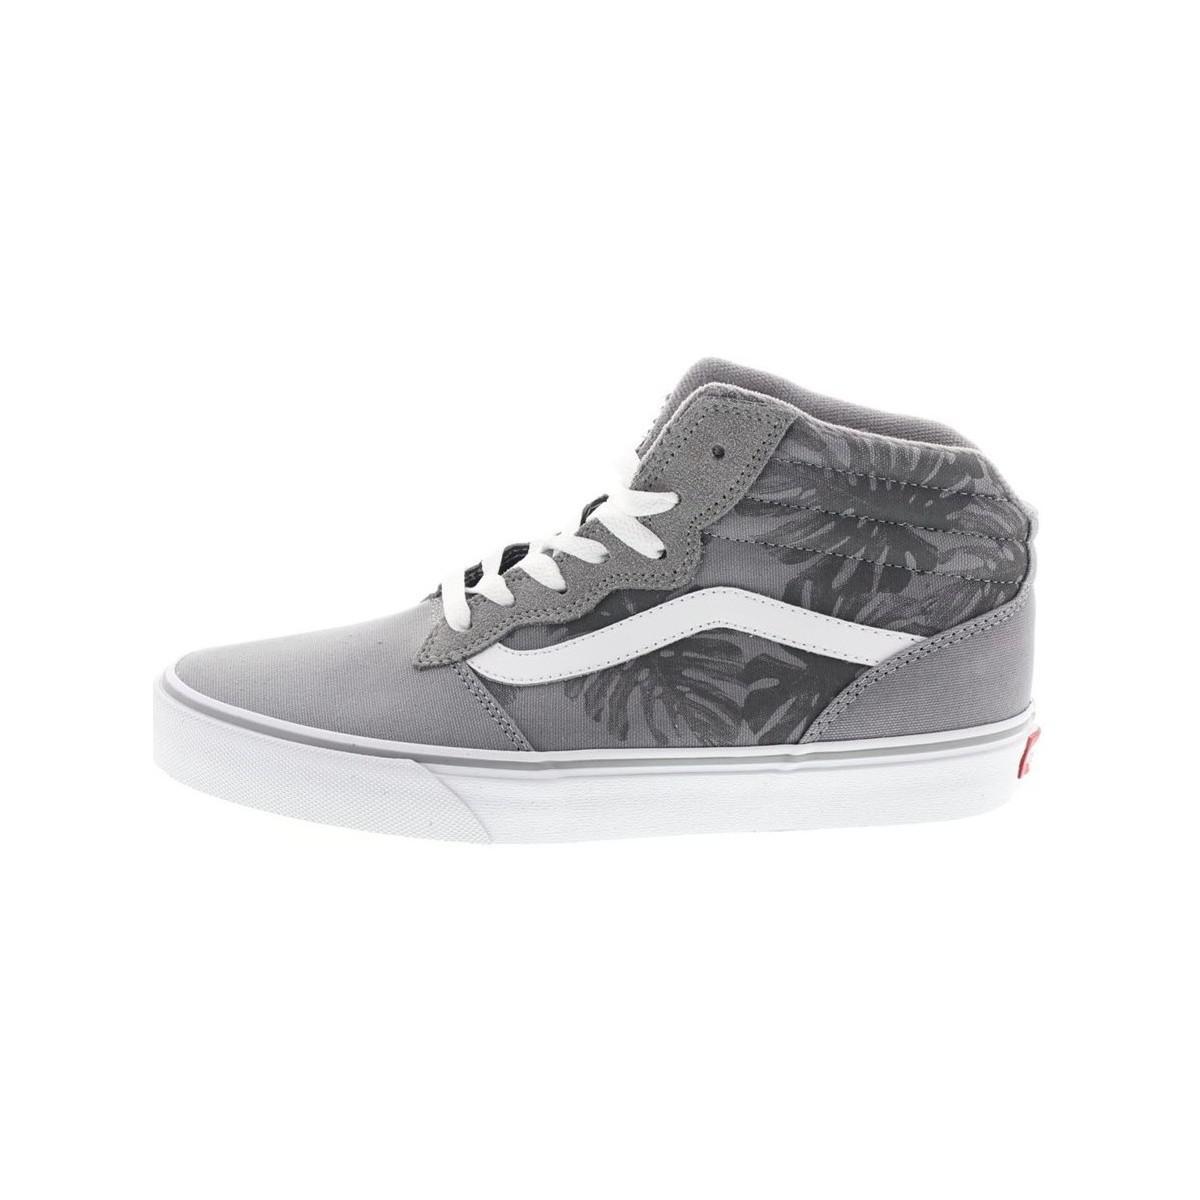 720b96287da359 Vans 187 B Milton High Men s Shoes (high-top Trainers) In ...